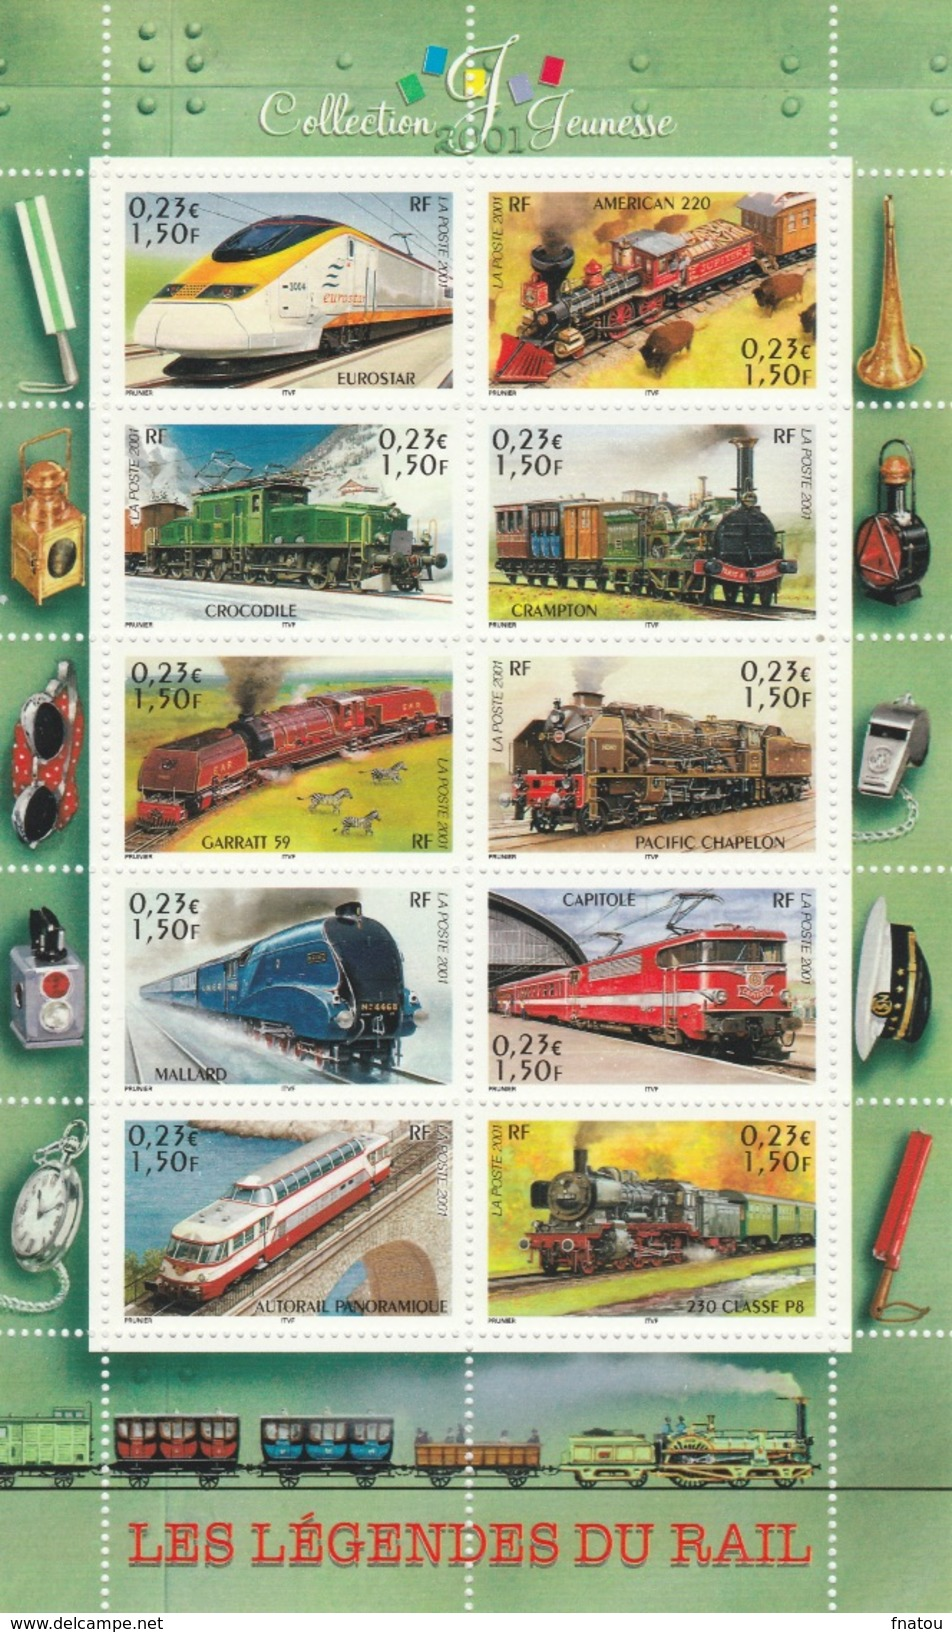 France, Famous Trains, Locomotives, 2001, MNH VF  Souvenir Sheet Of 10 - France